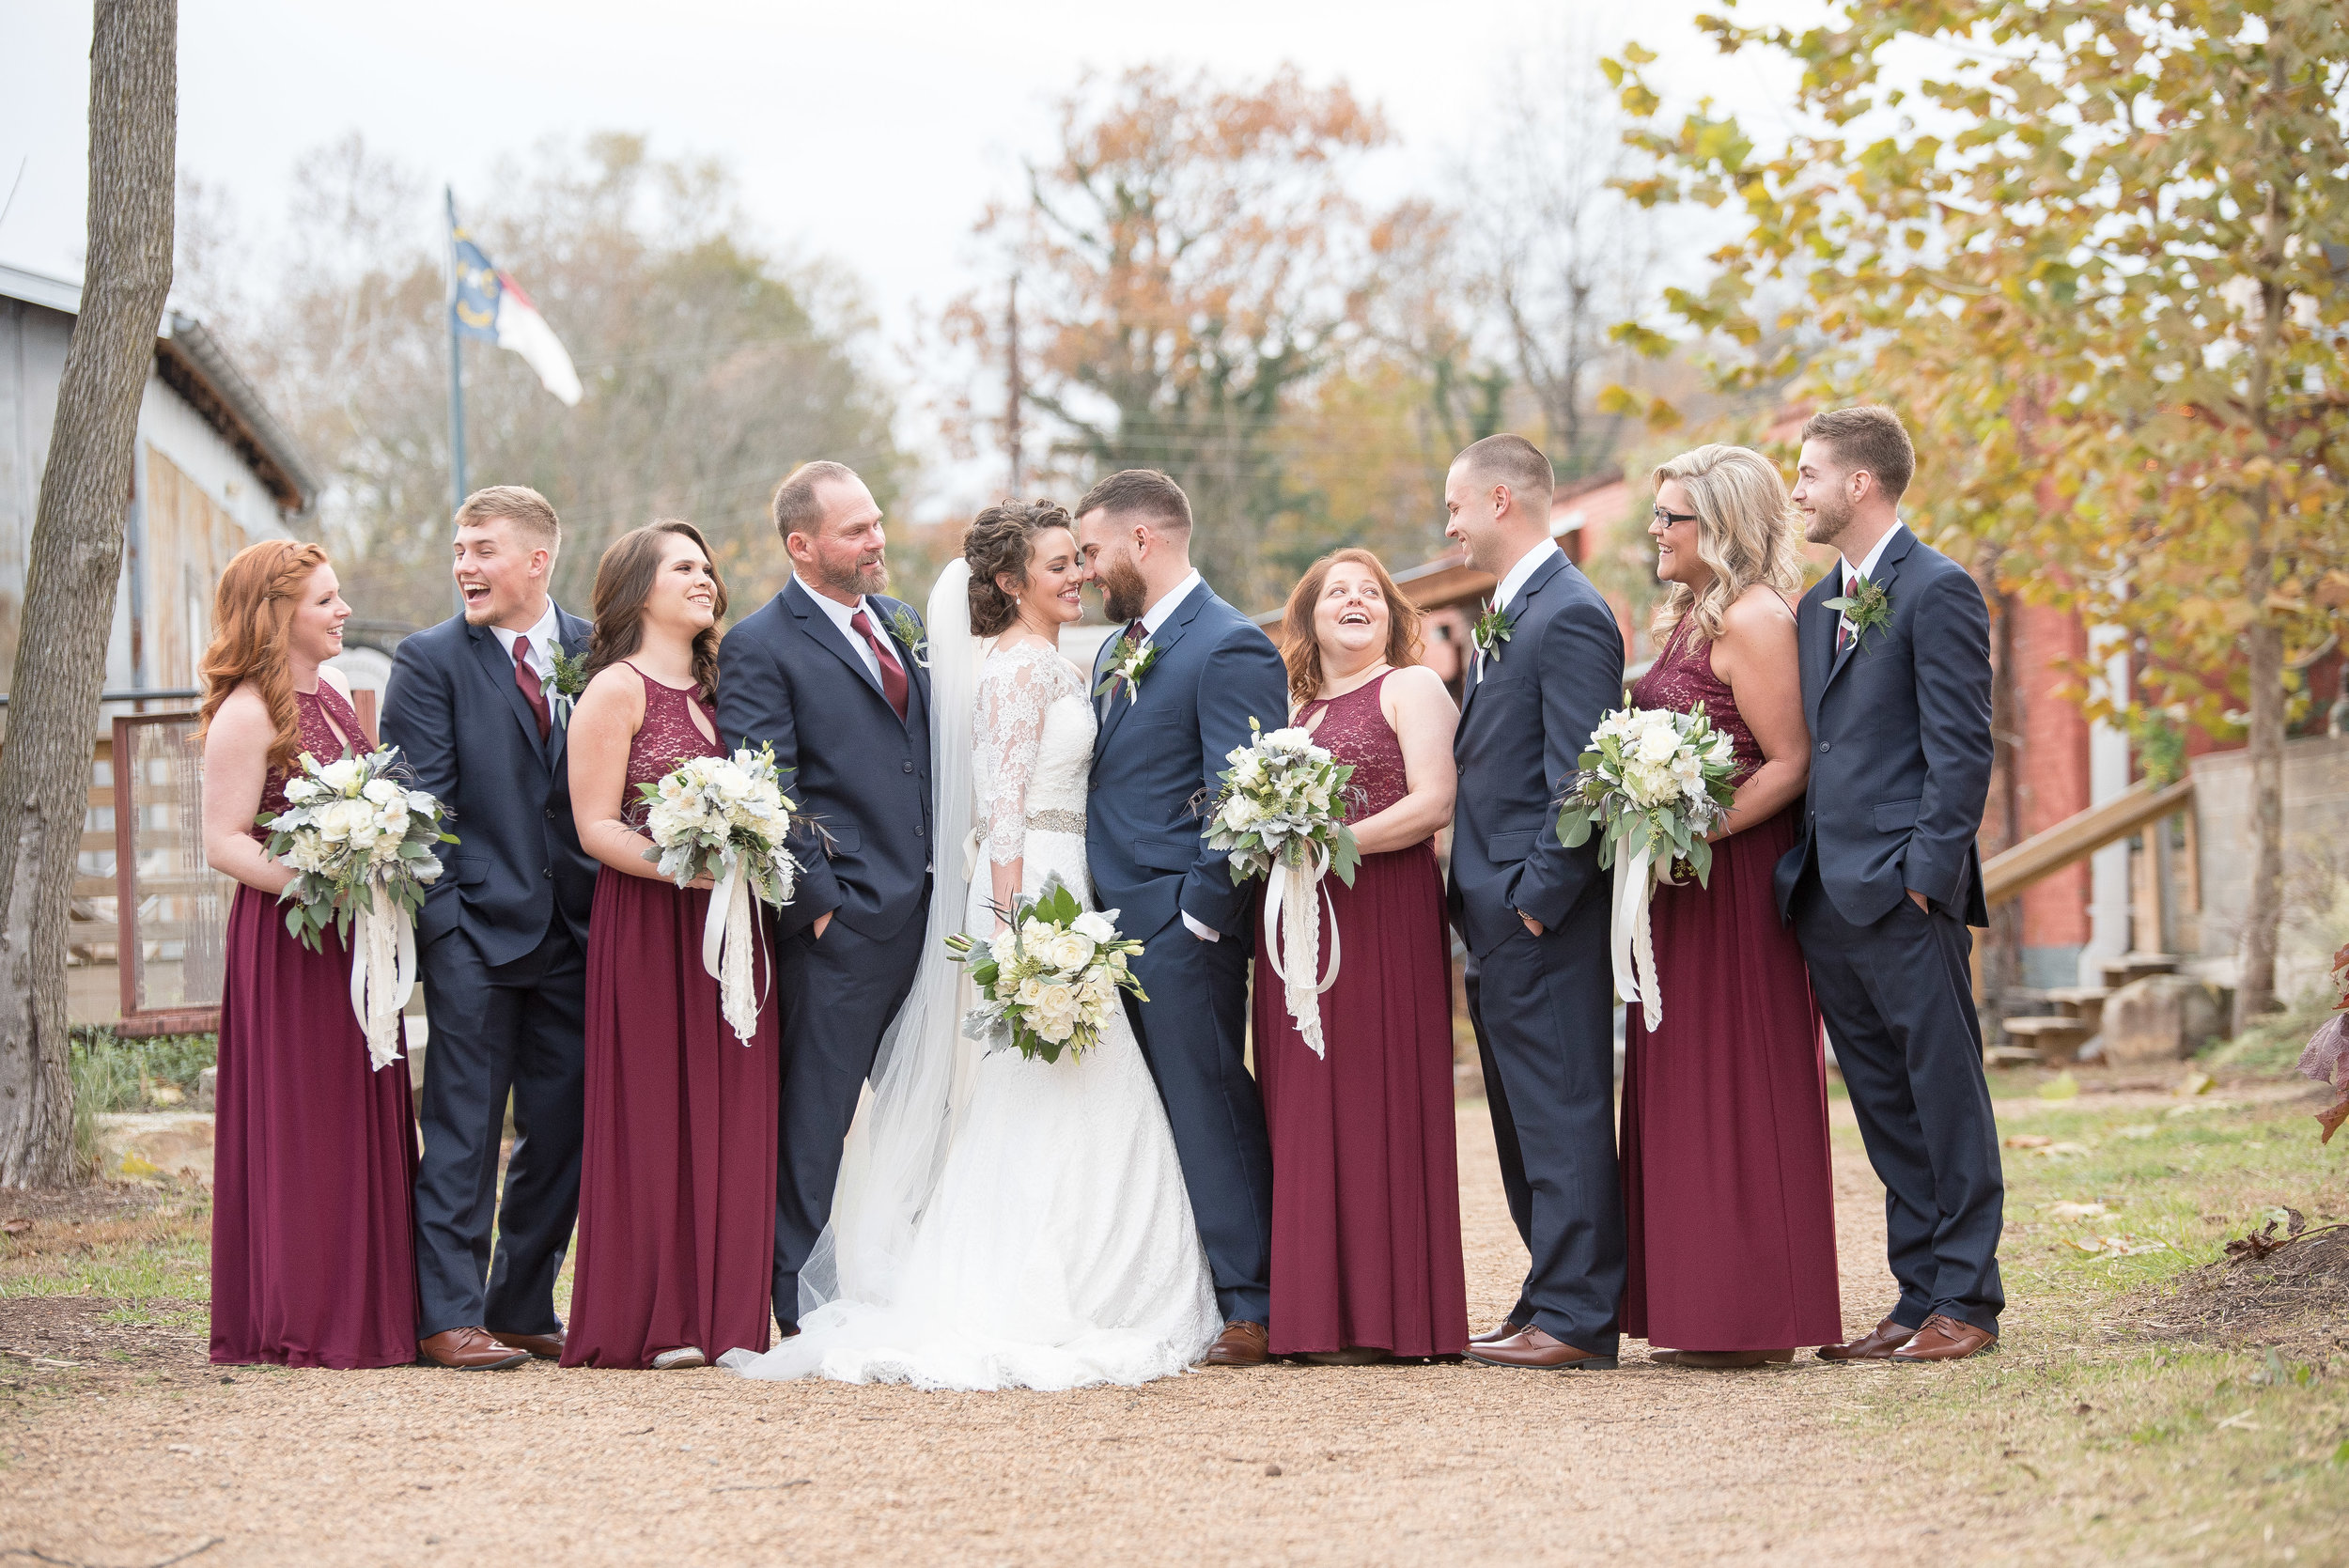 The Roller Mill Events - Winston Salem Weddings - NC Weddings - High Point NC Weddings - Winston Salem Venue - Yasmin Leonard Photography-55.jpg